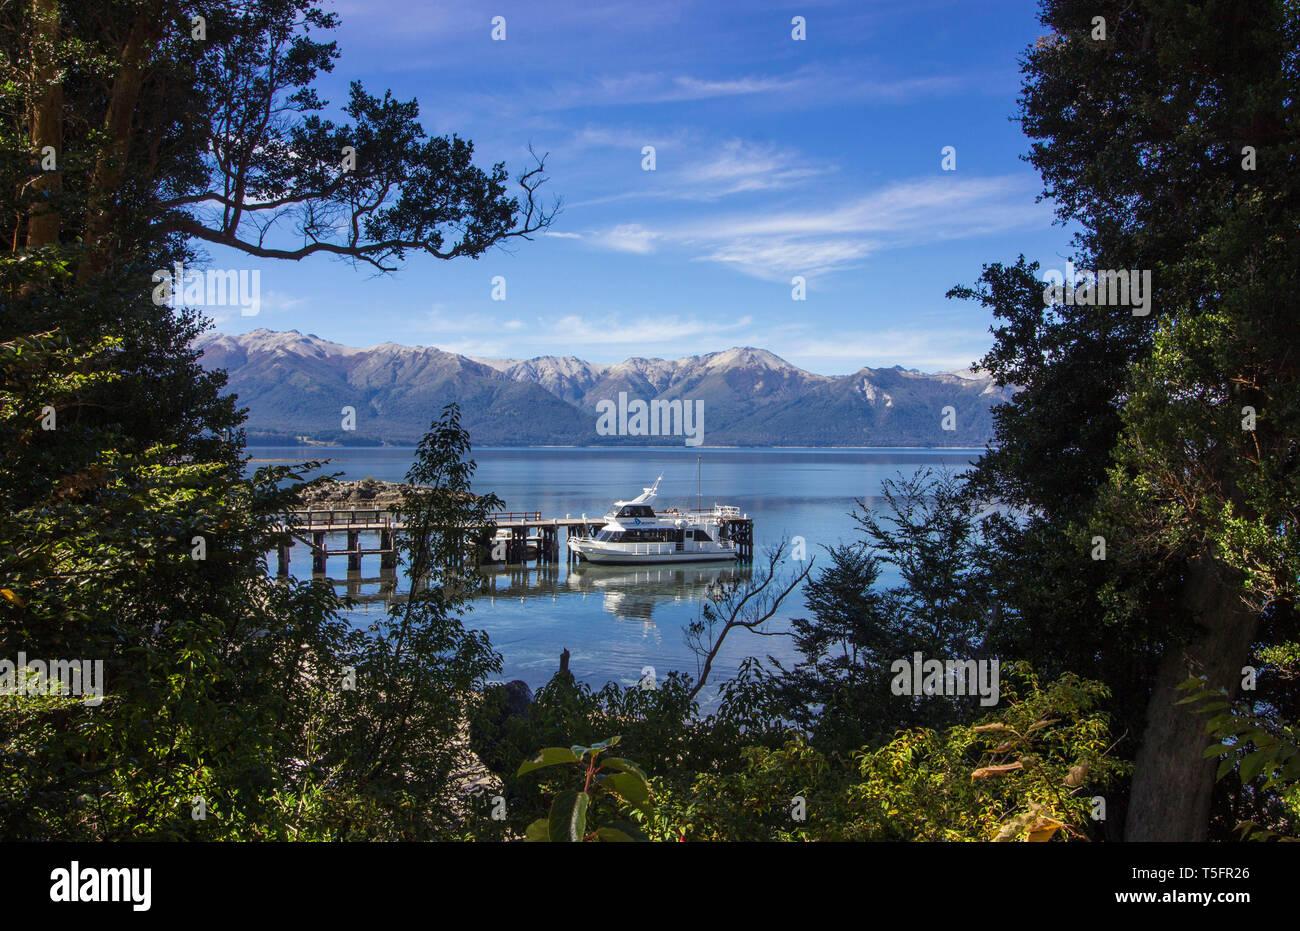 Ferry atl Los Arrayanes - Stock Image